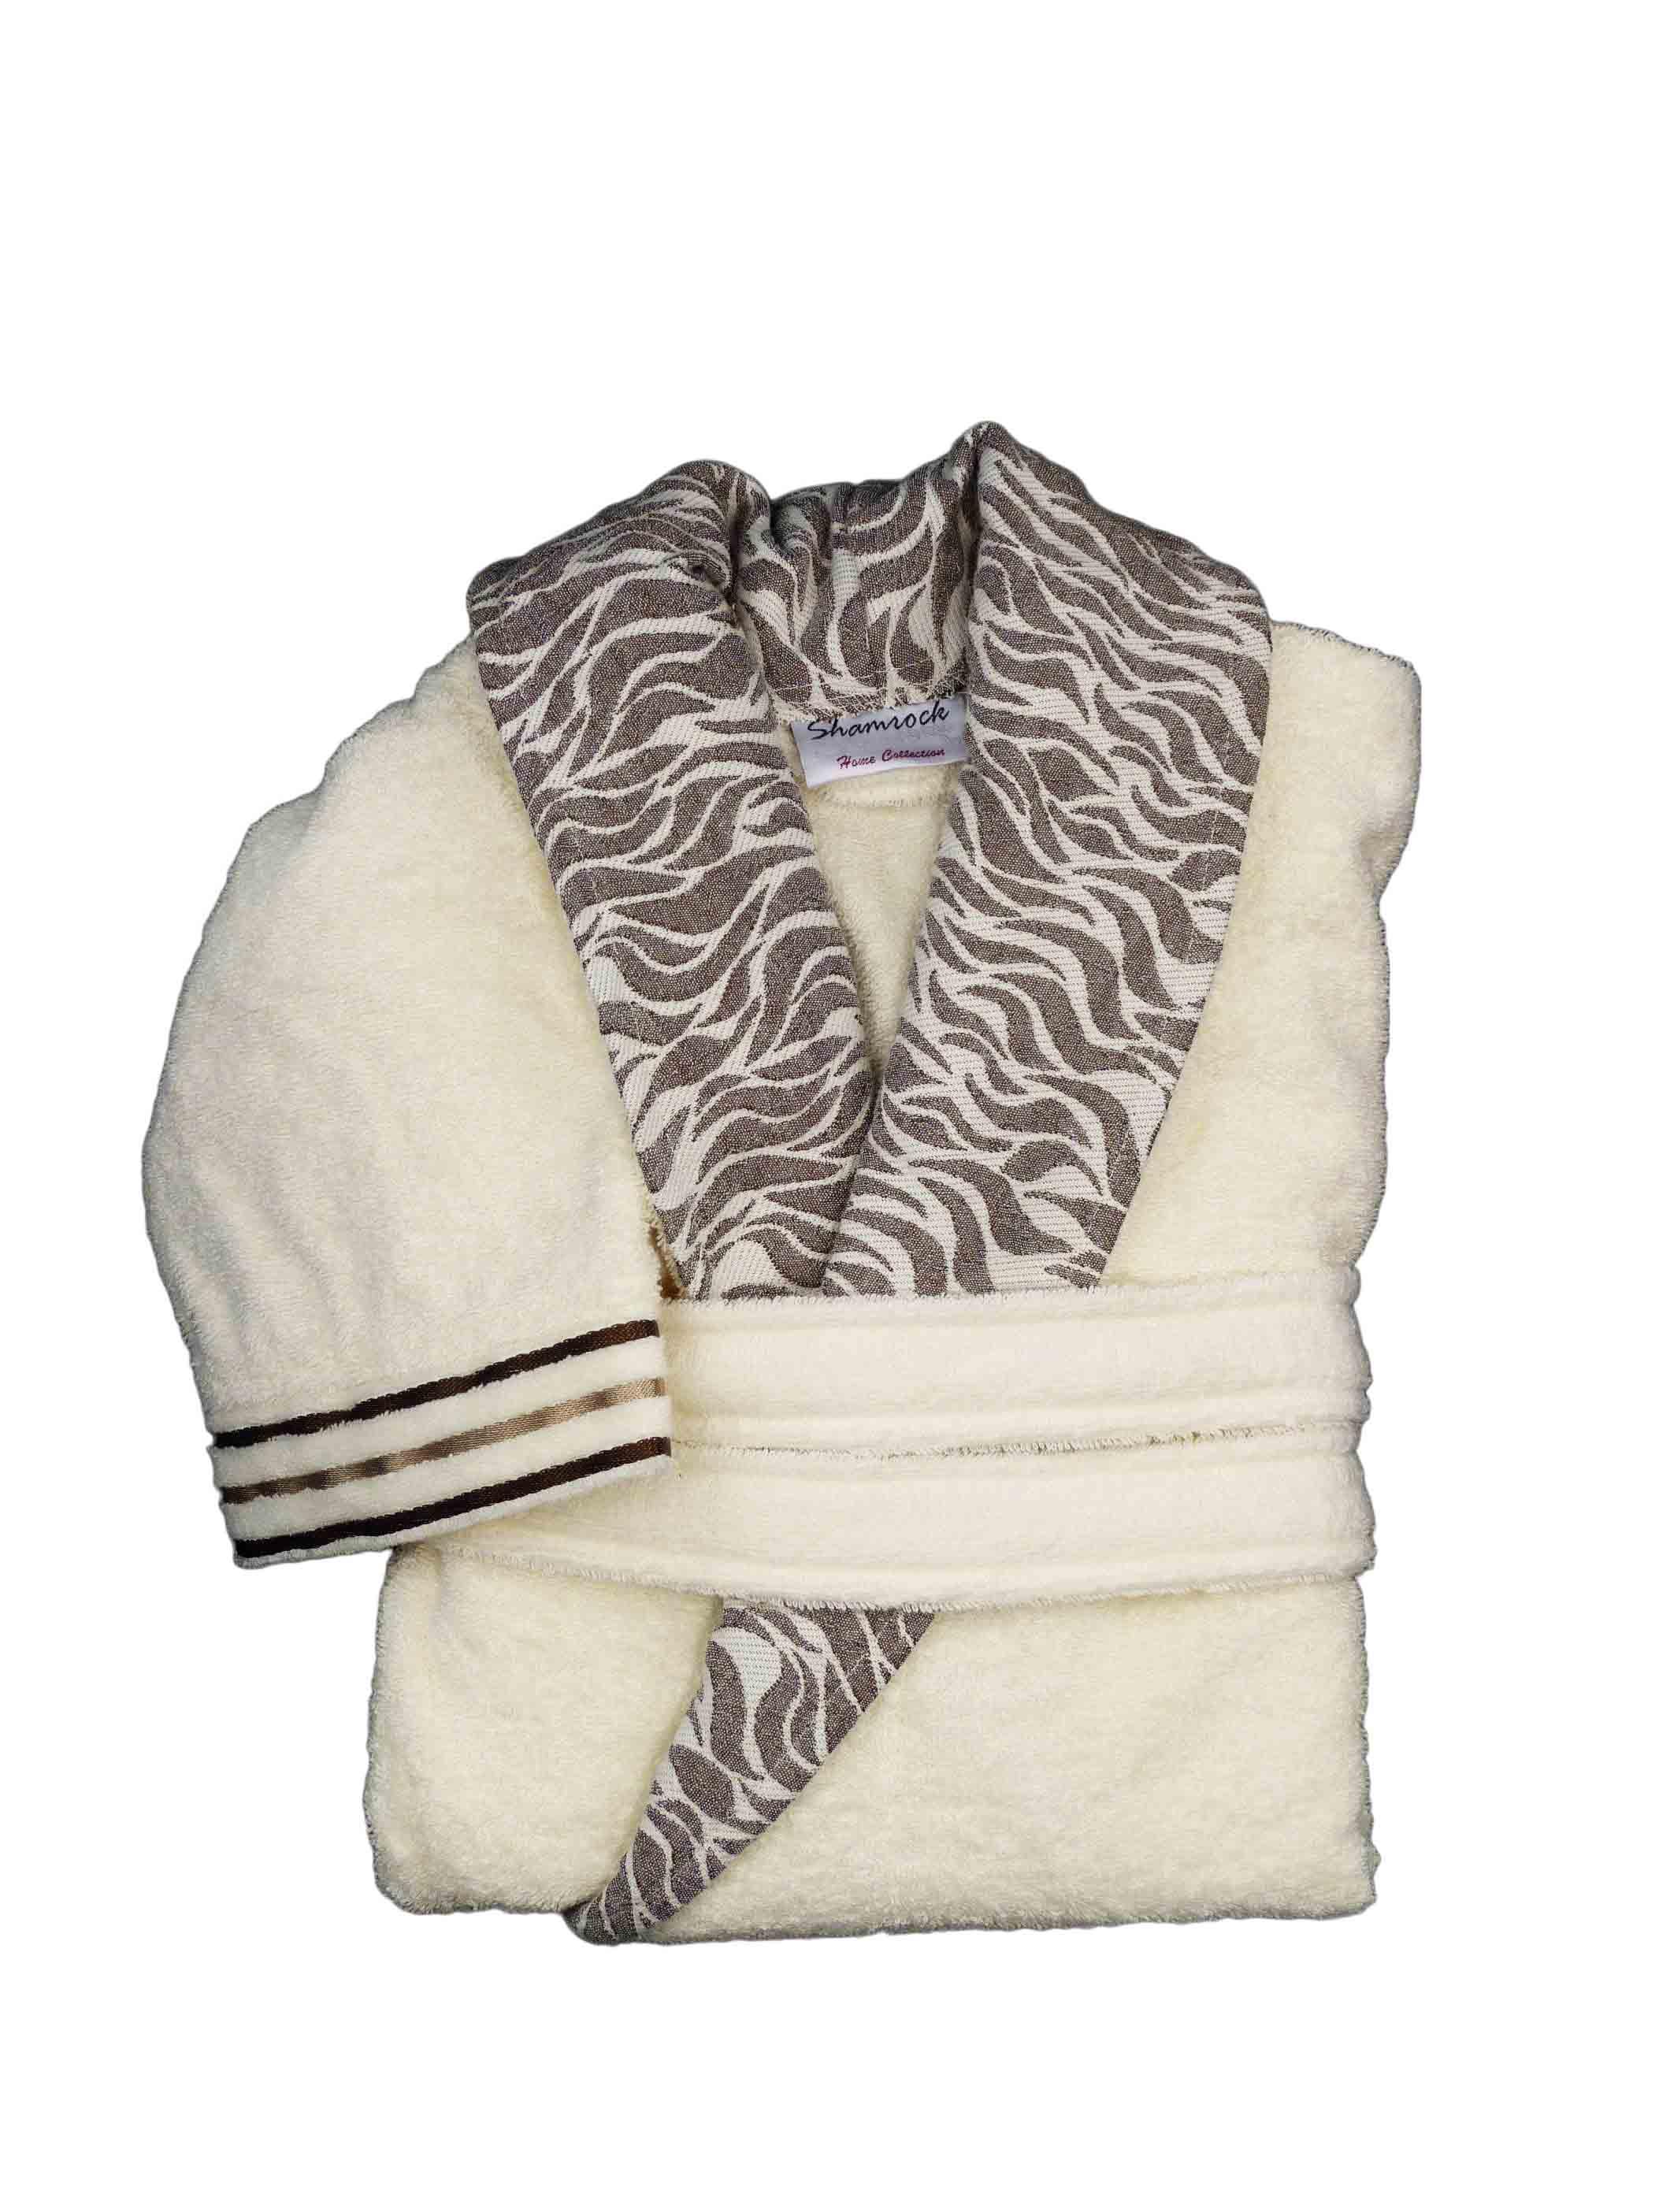 luxus bademantel damen herren 100 baumwolle saugf hig morgenmantel saunamantel ebay. Black Bedroom Furniture Sets. Home Design Ideas